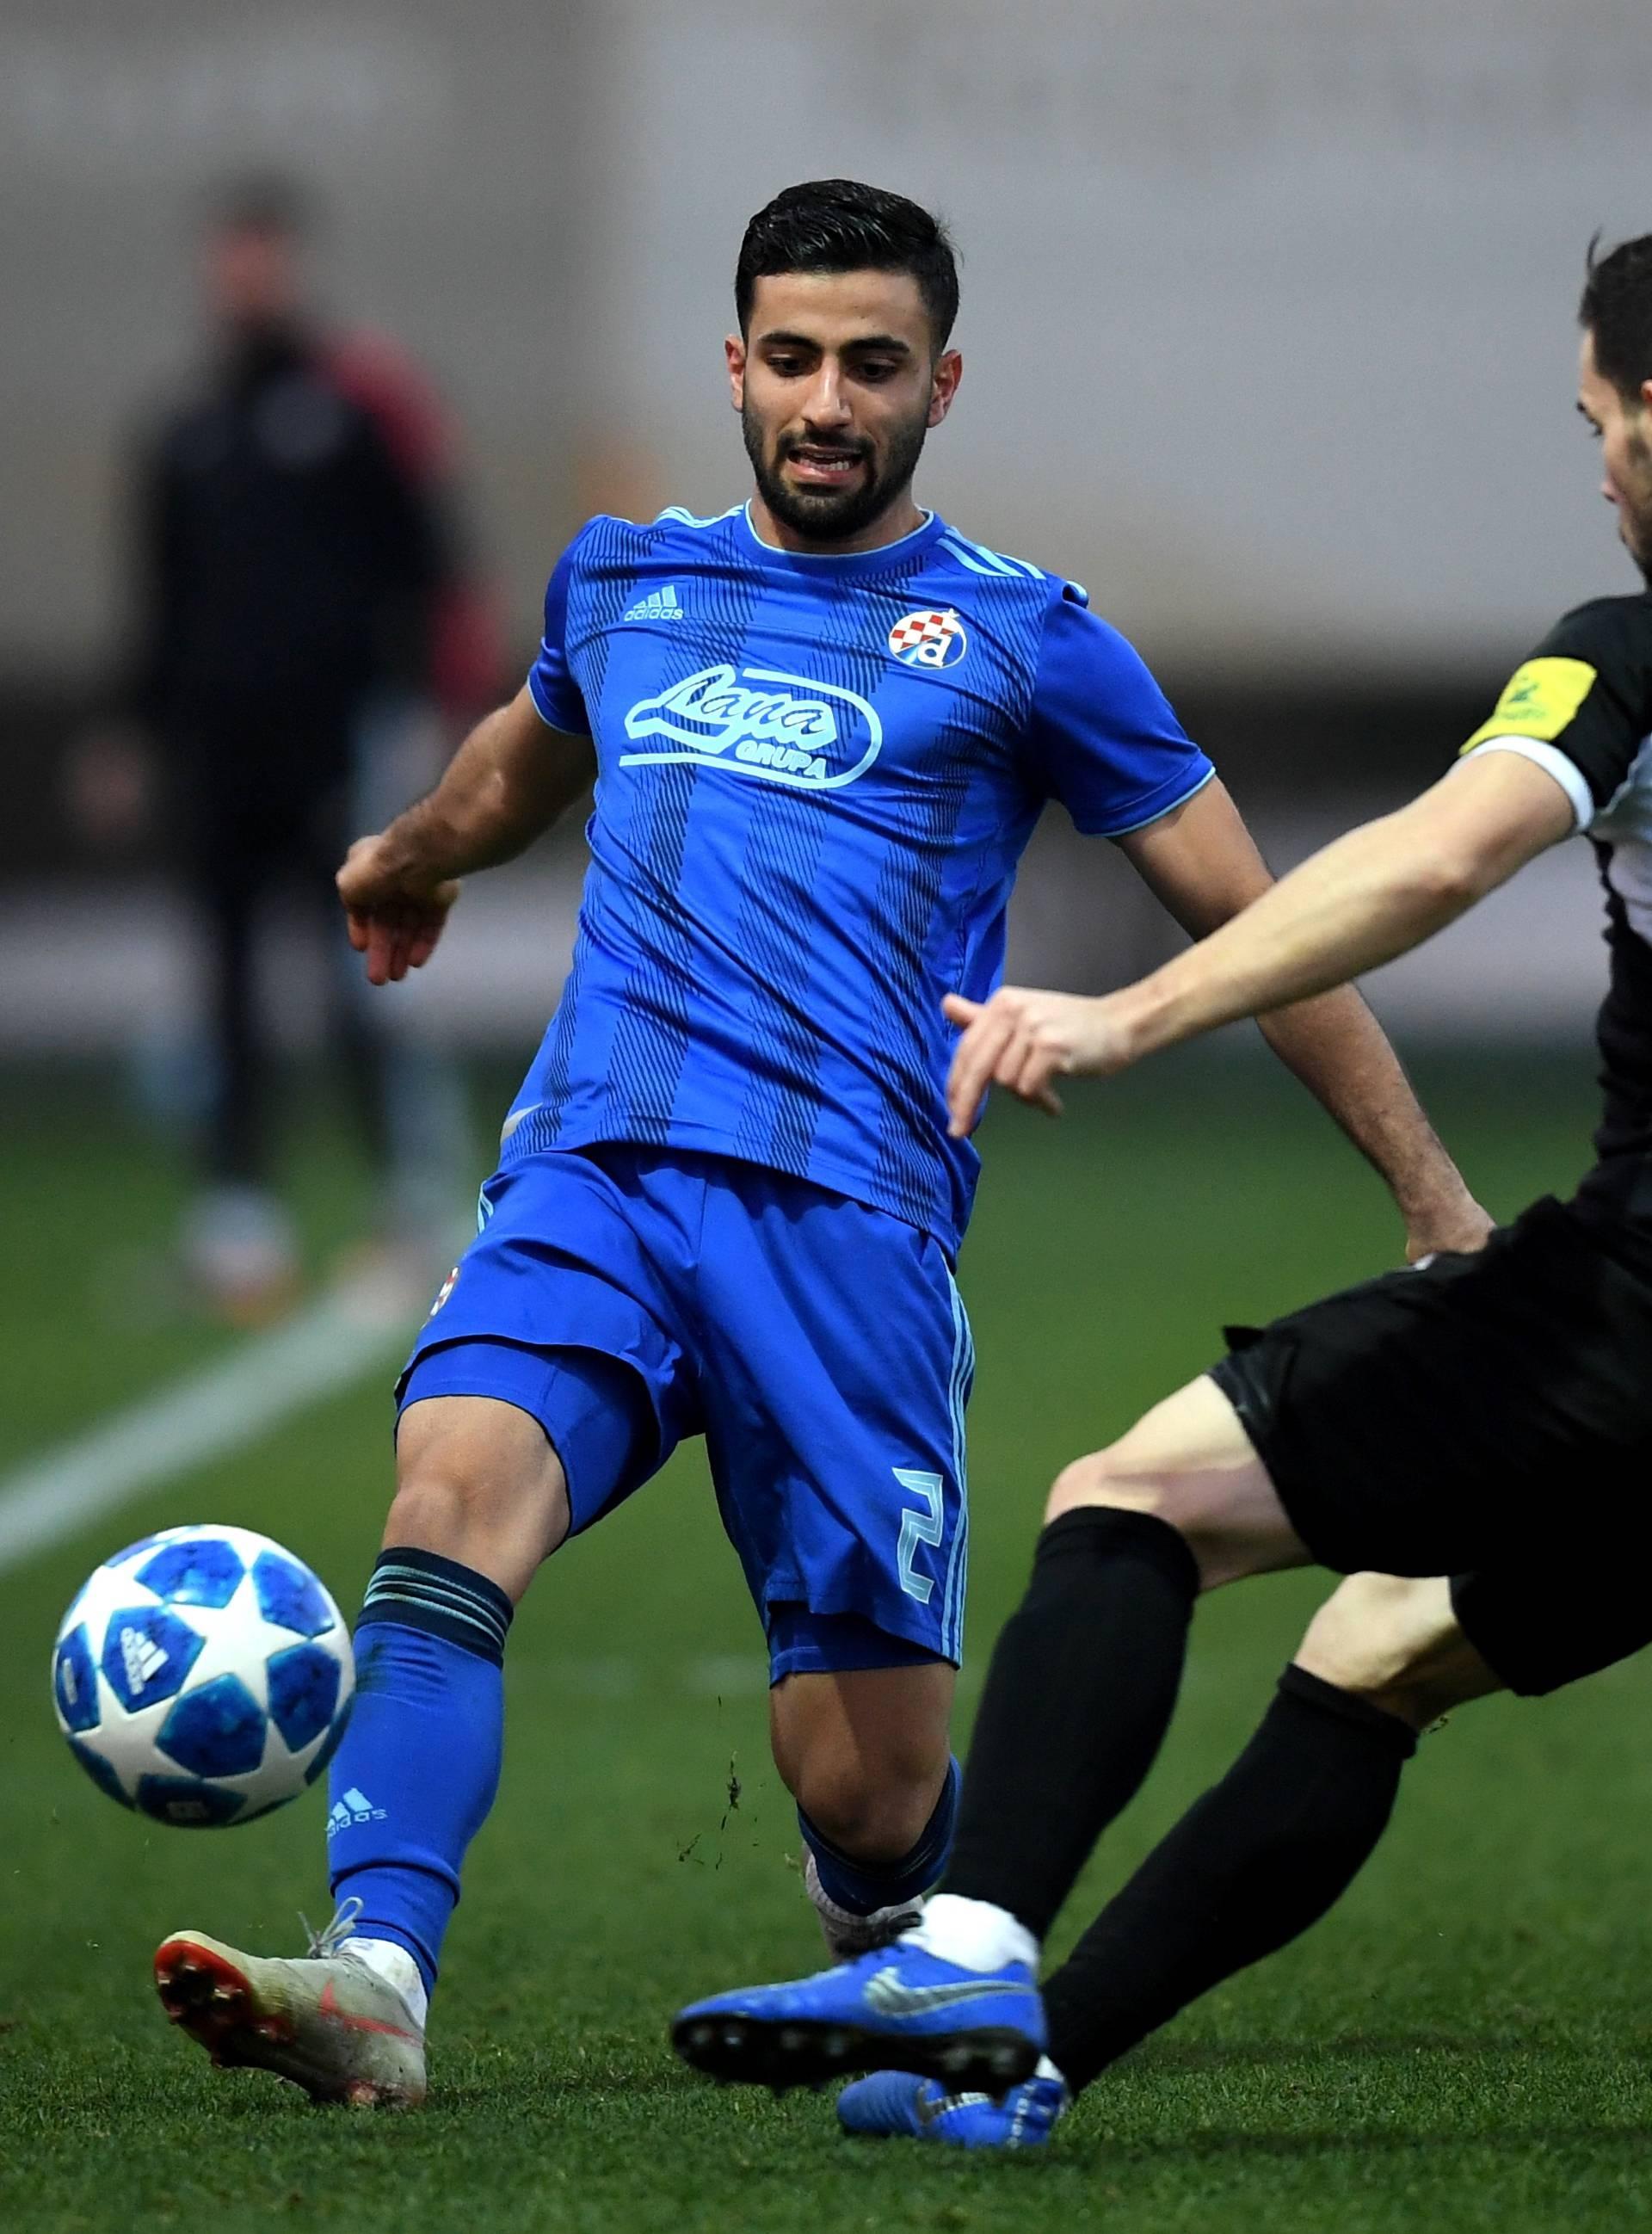 Belek: Prijateljska utakmica između GNK Dinamo i CSMS Politehnica IASI